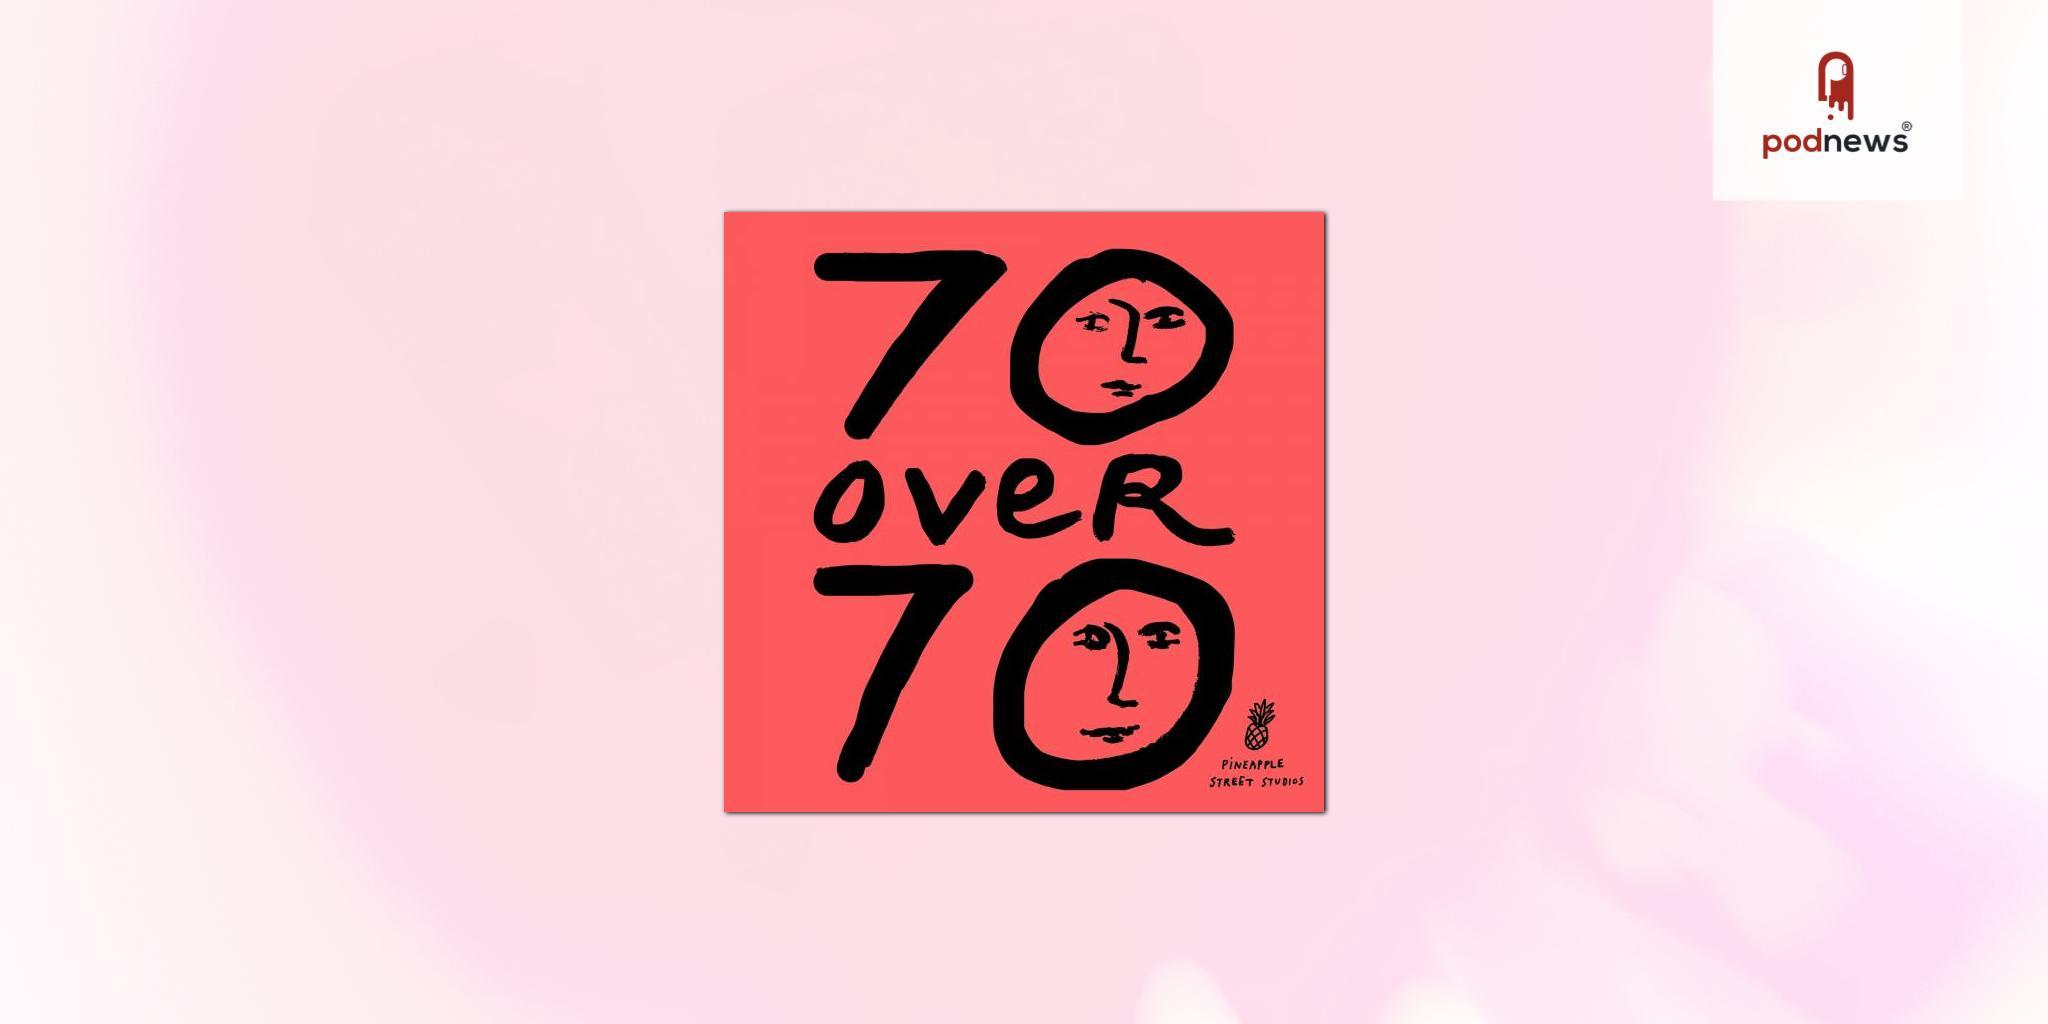 Pineapple Street Studios Launches Original Series 70 Over 70